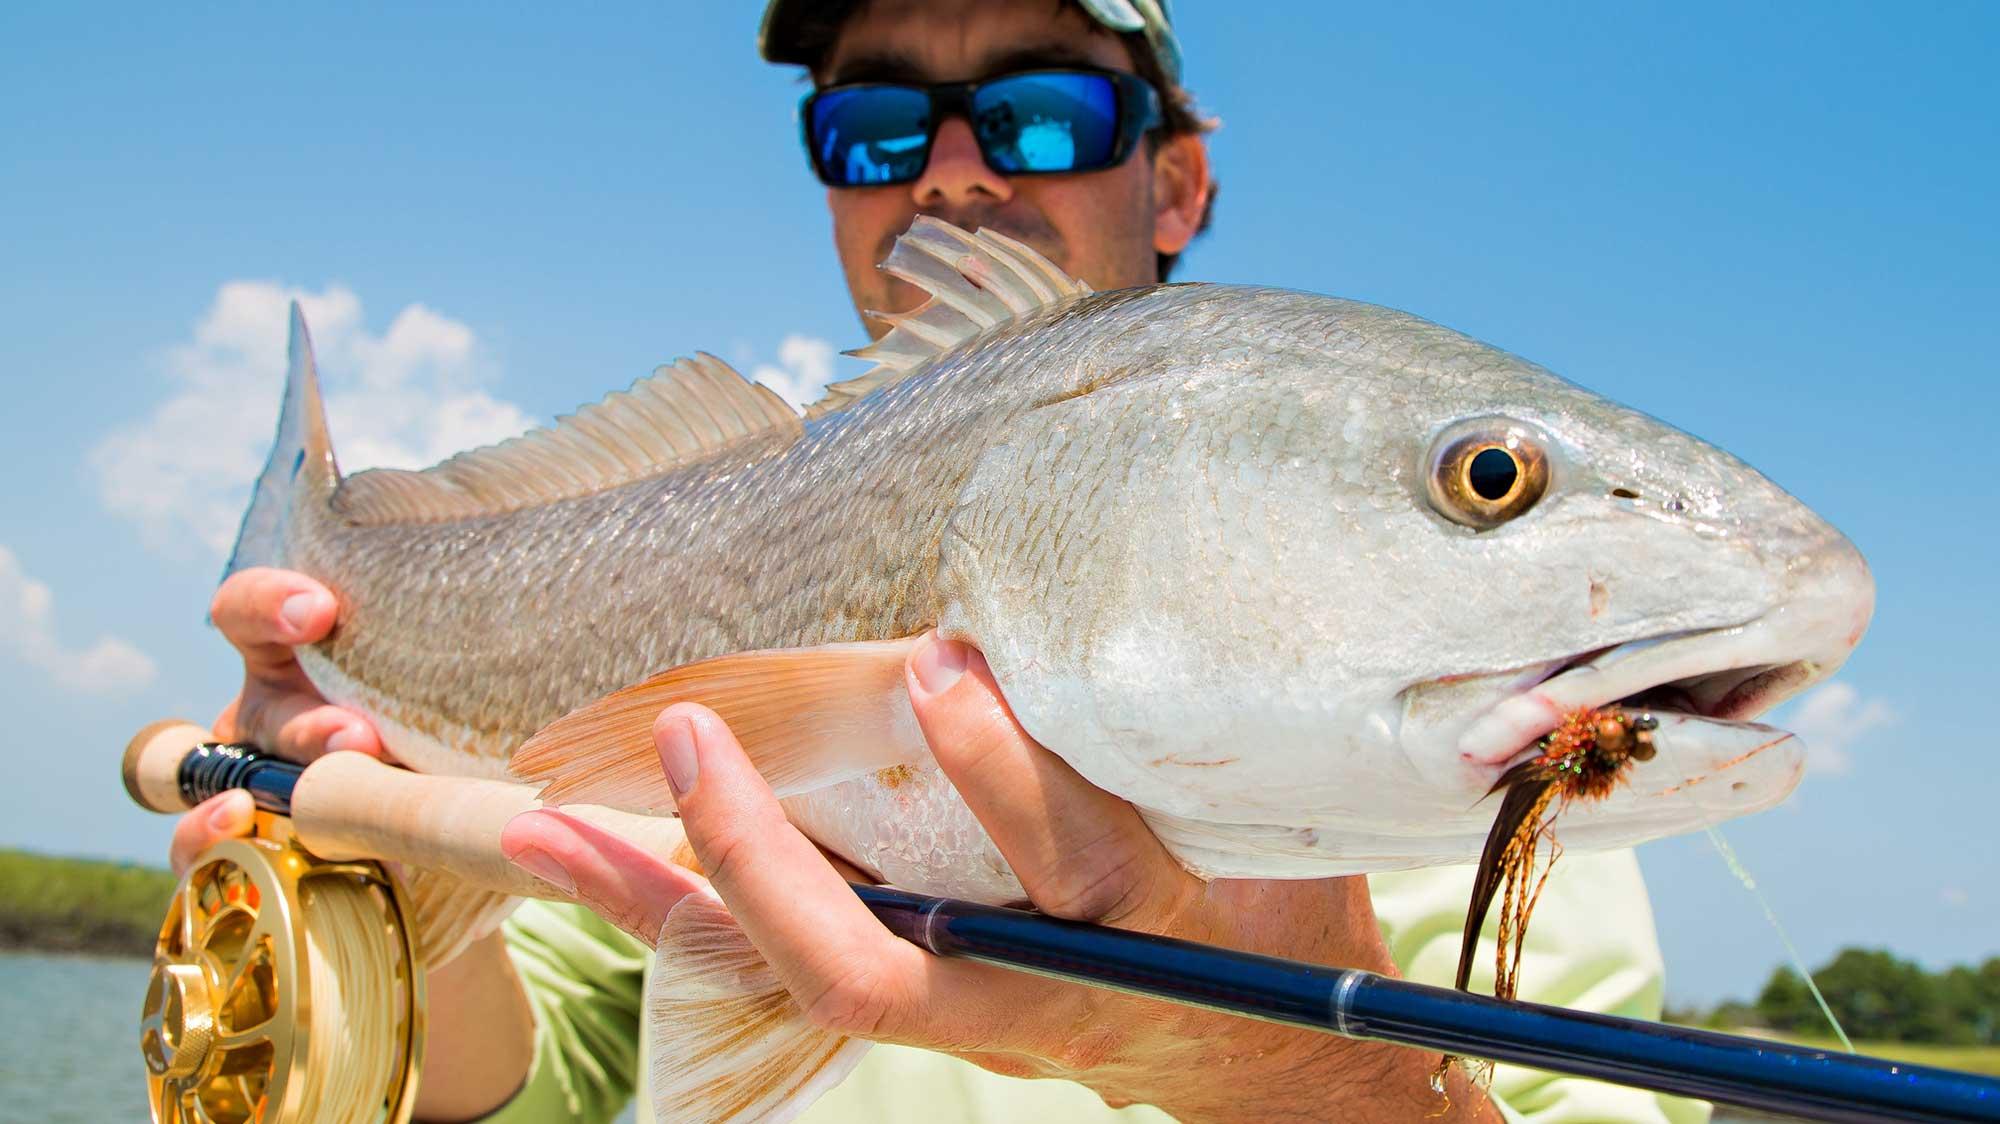 Fishing charter angler holding redfish